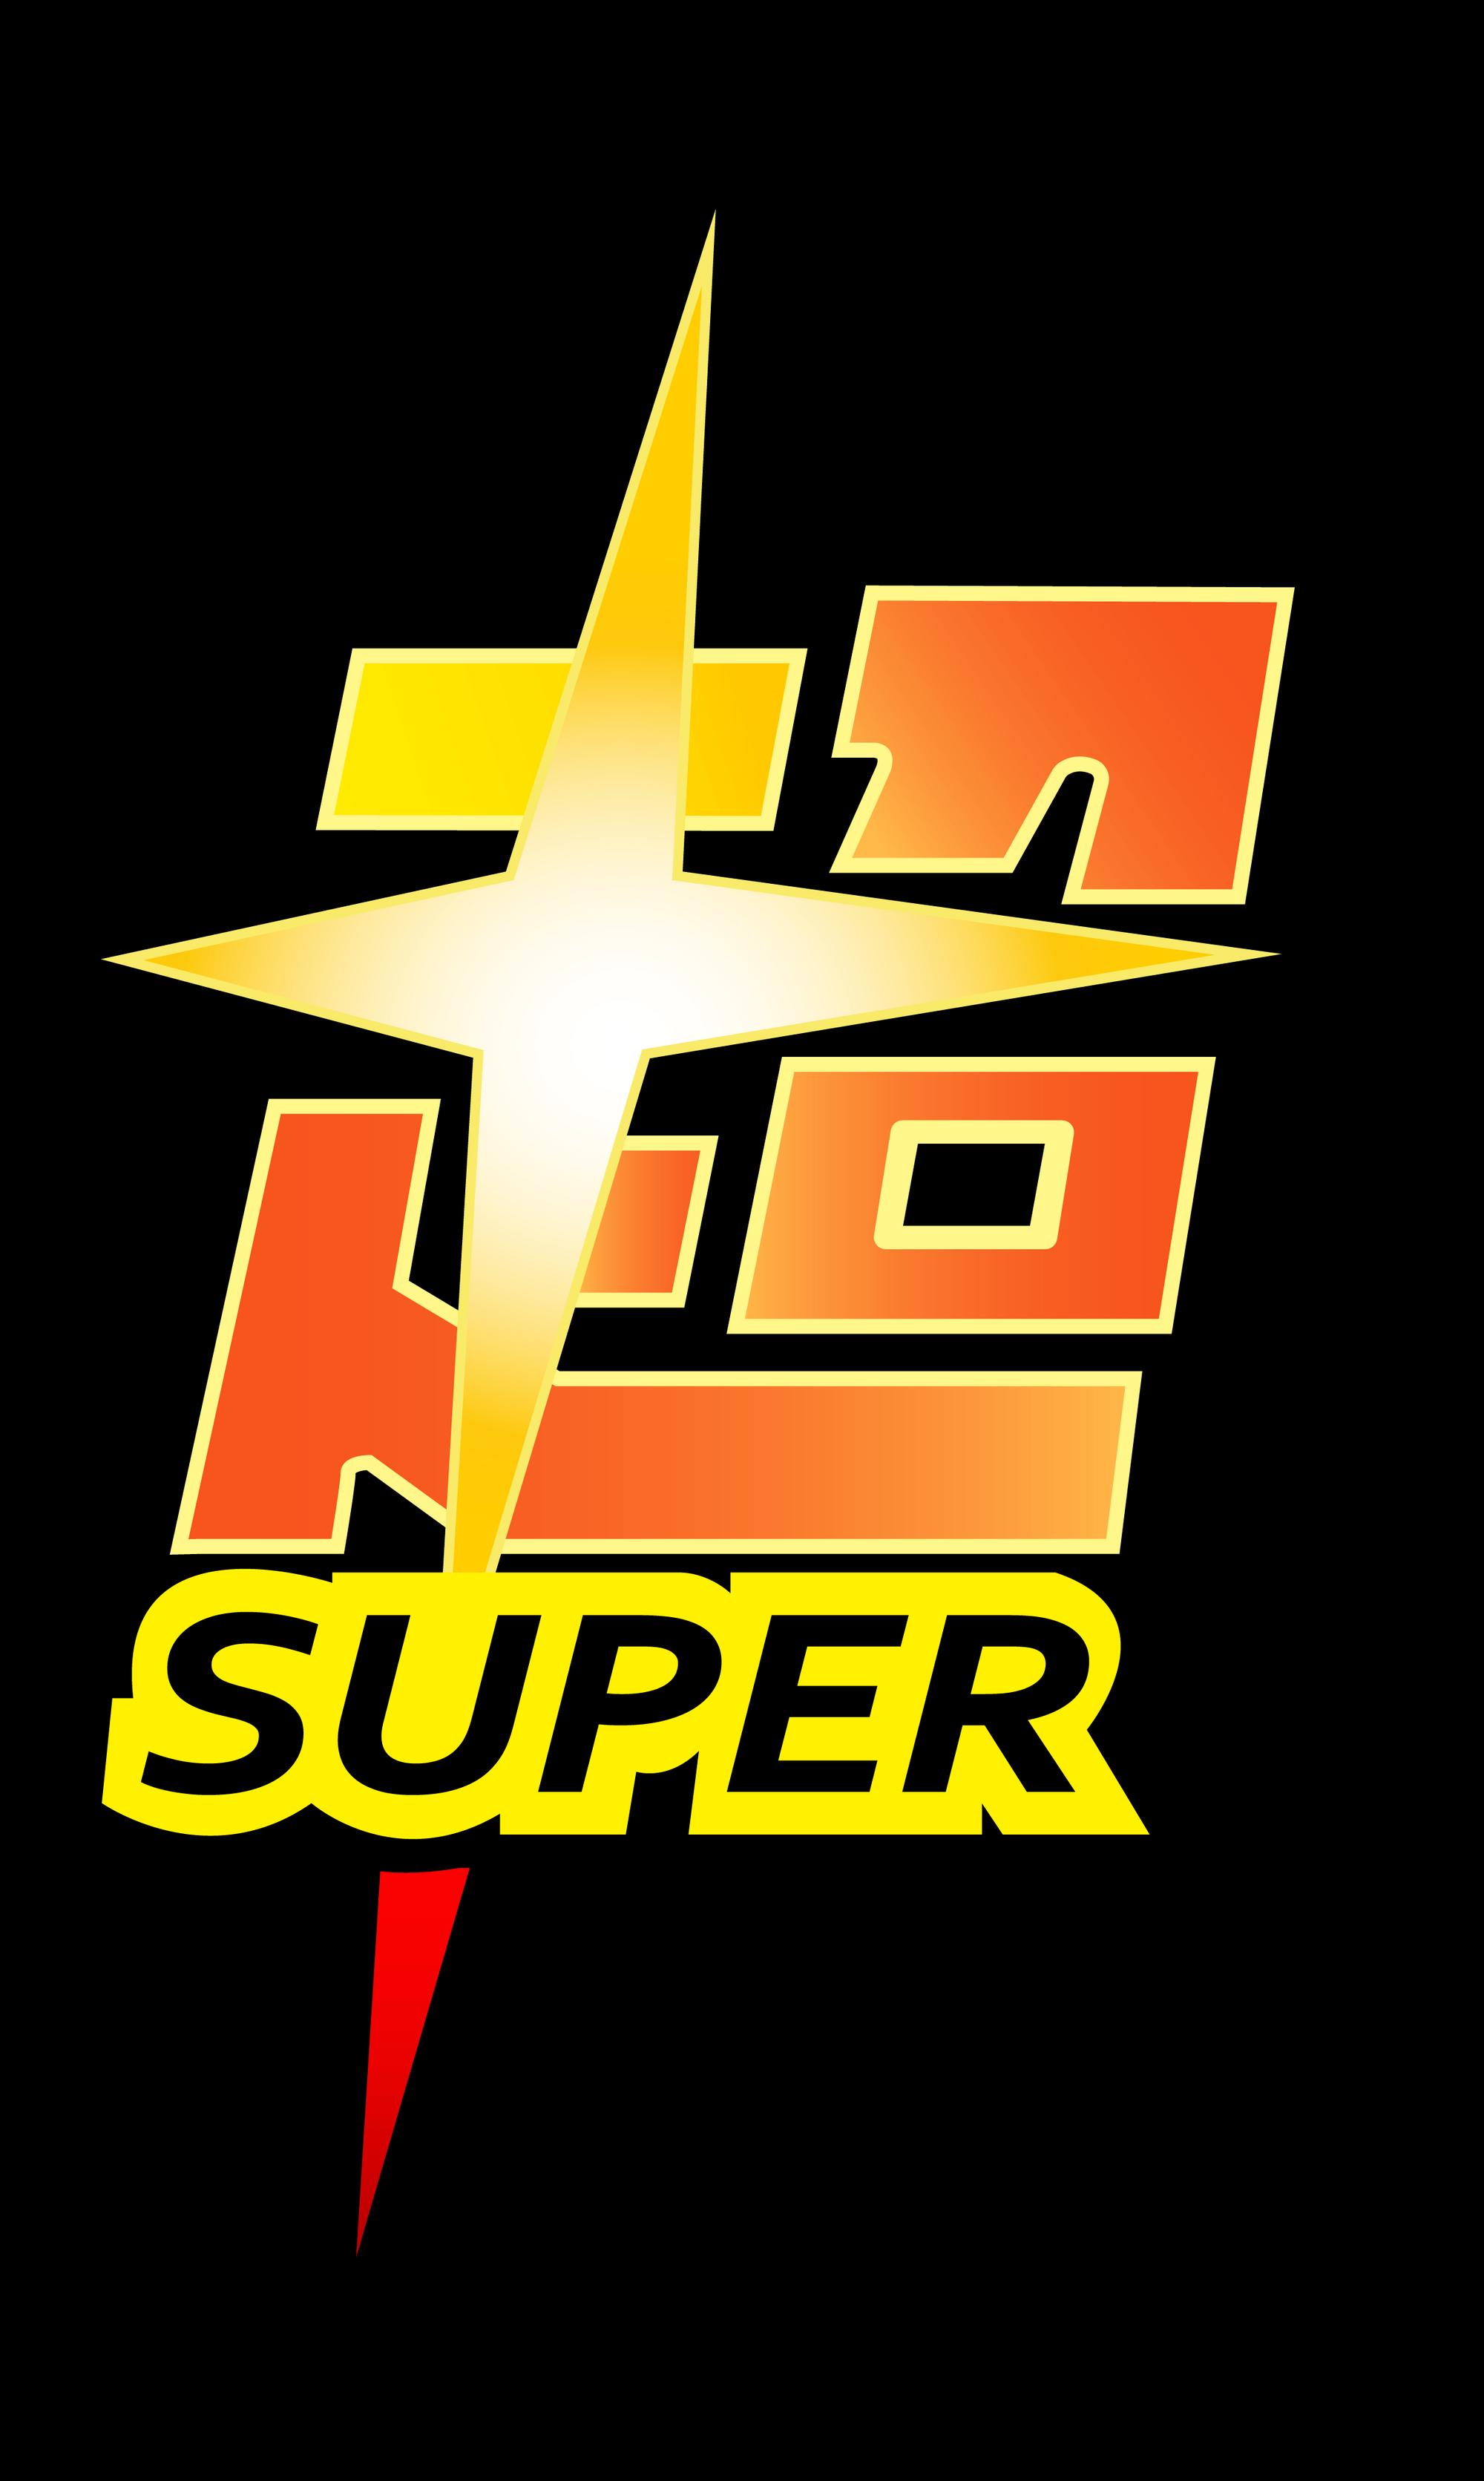 Dragon Ball Super Logo Png: Imagen - Logo Dragon Ball Super PNG.png